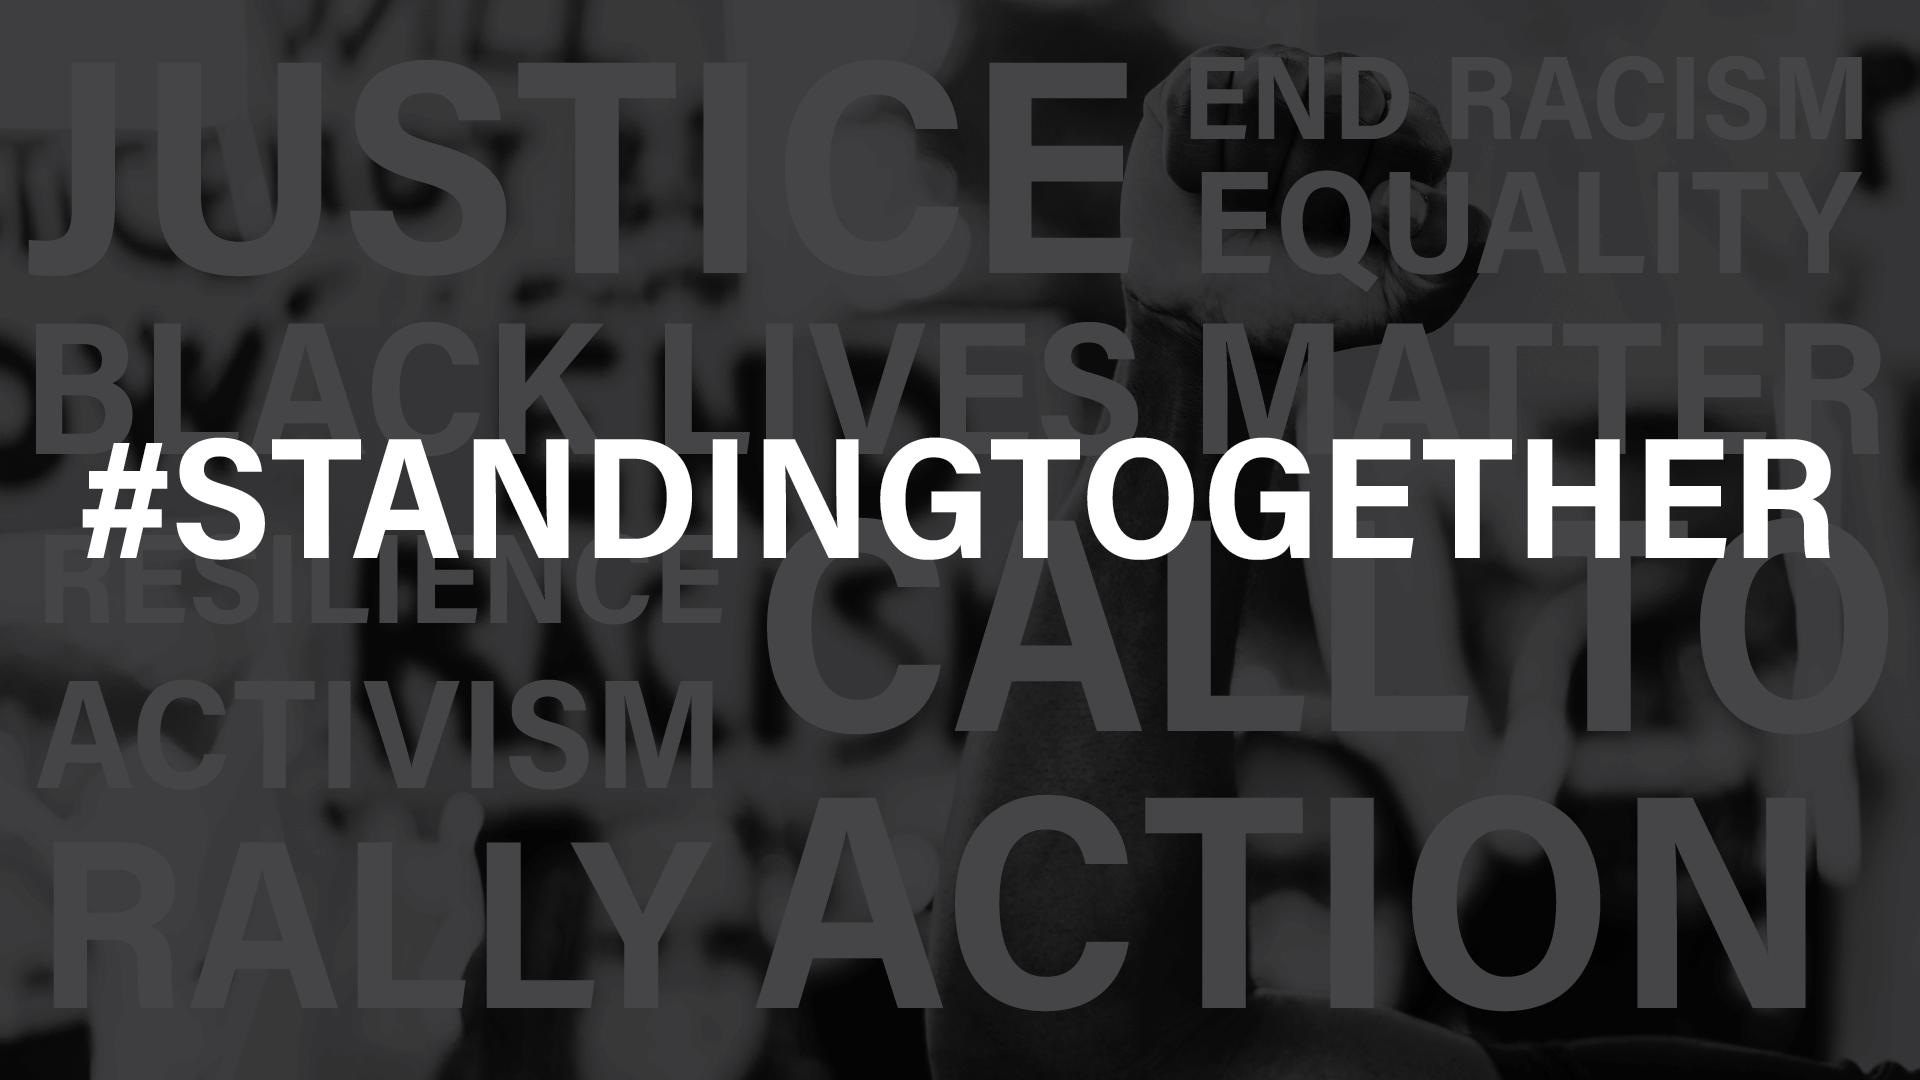 #Standingtogether